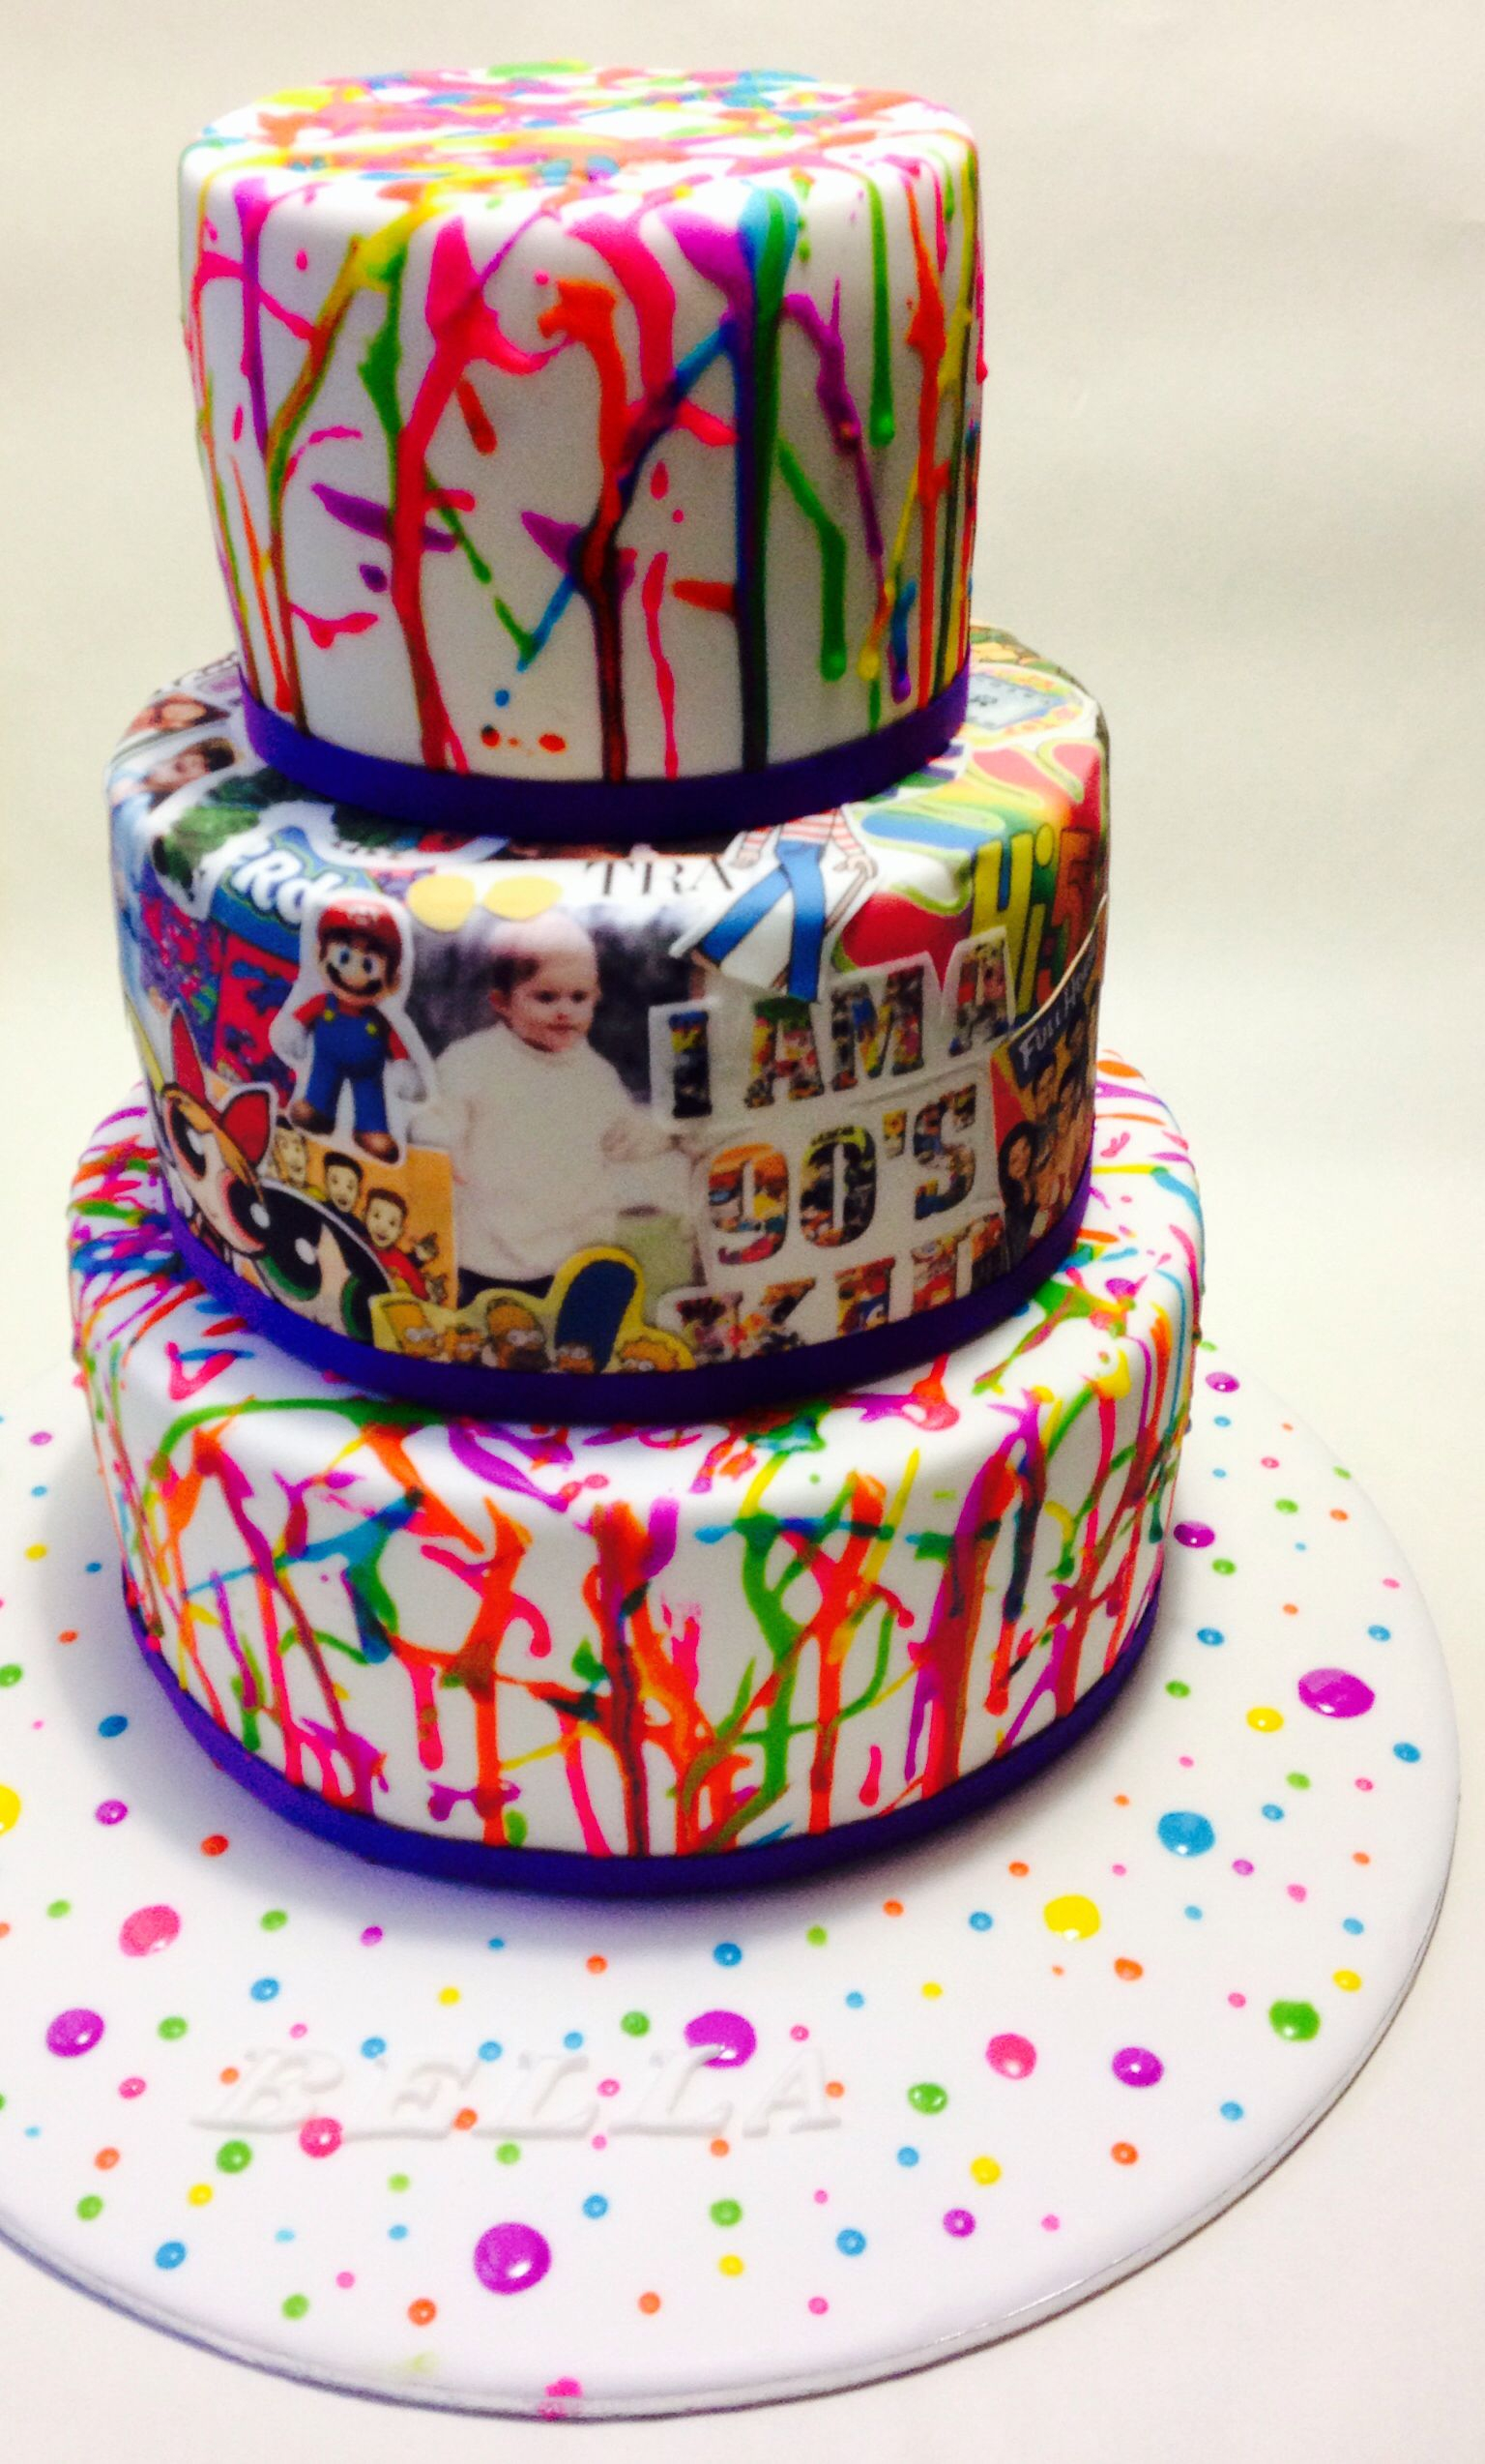 Tremendous 21 Best Photo Of 90S Birthday Cake Birijus Com Personalised Birthday Cards Beptaeletsinfo